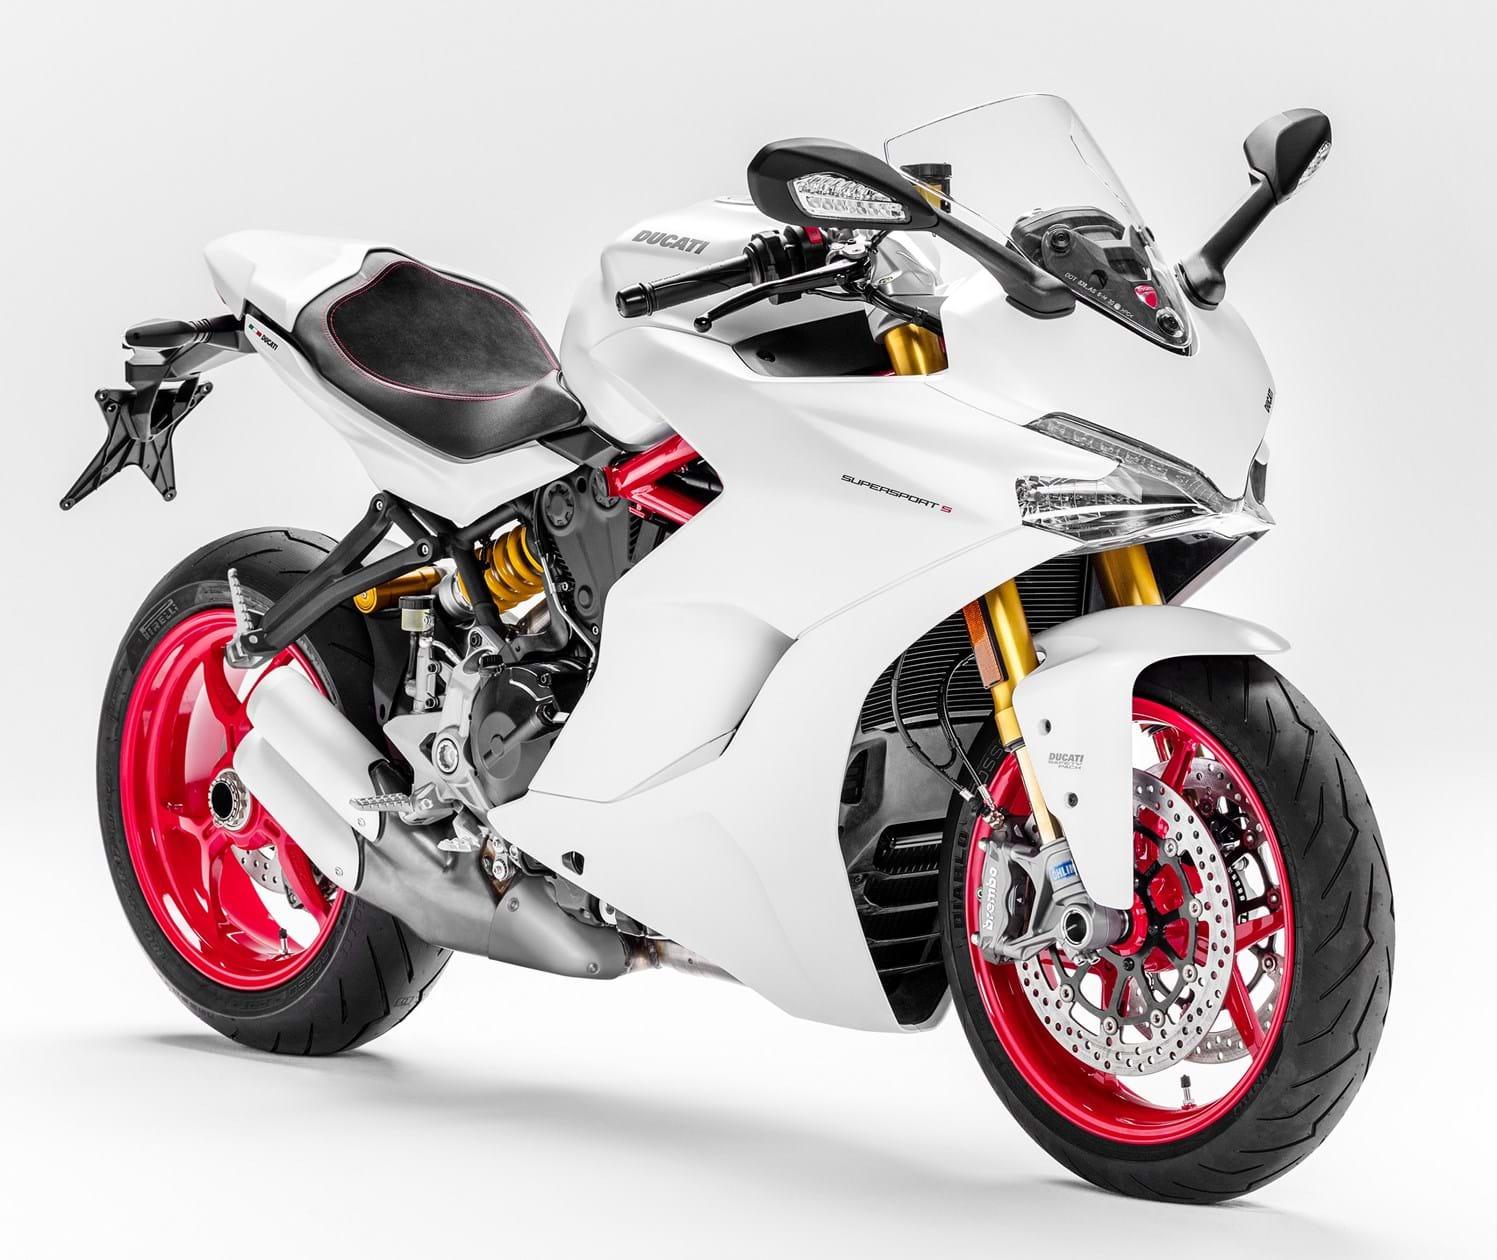 For Sale Ducati Supersport S The Bike Market